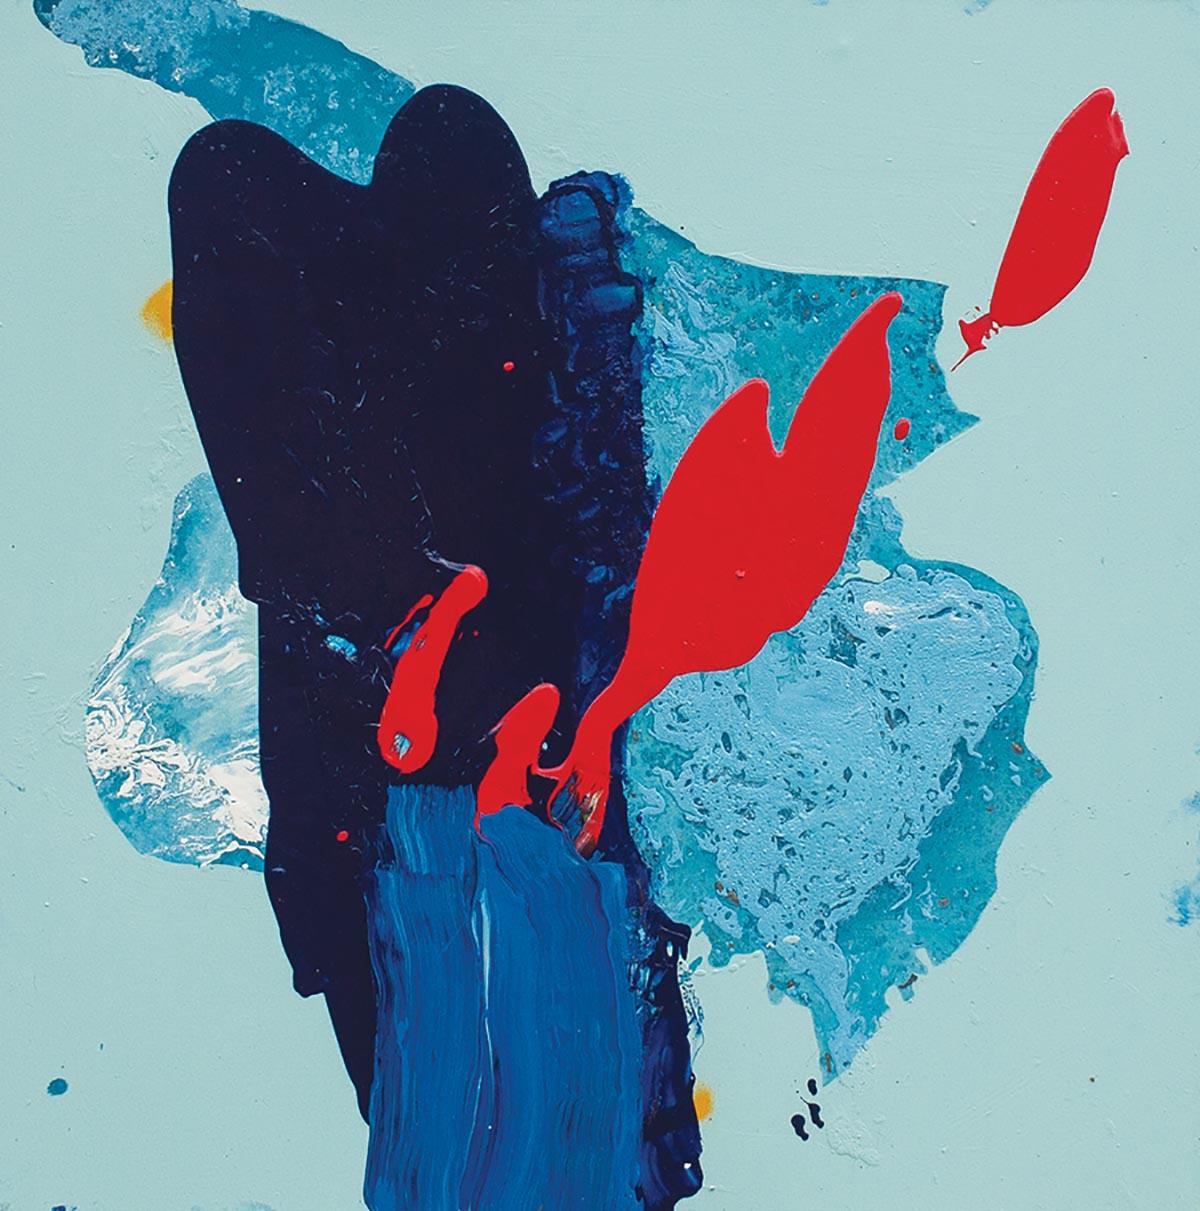 the-red-arrow-gallery-daniel-holland-toblerone